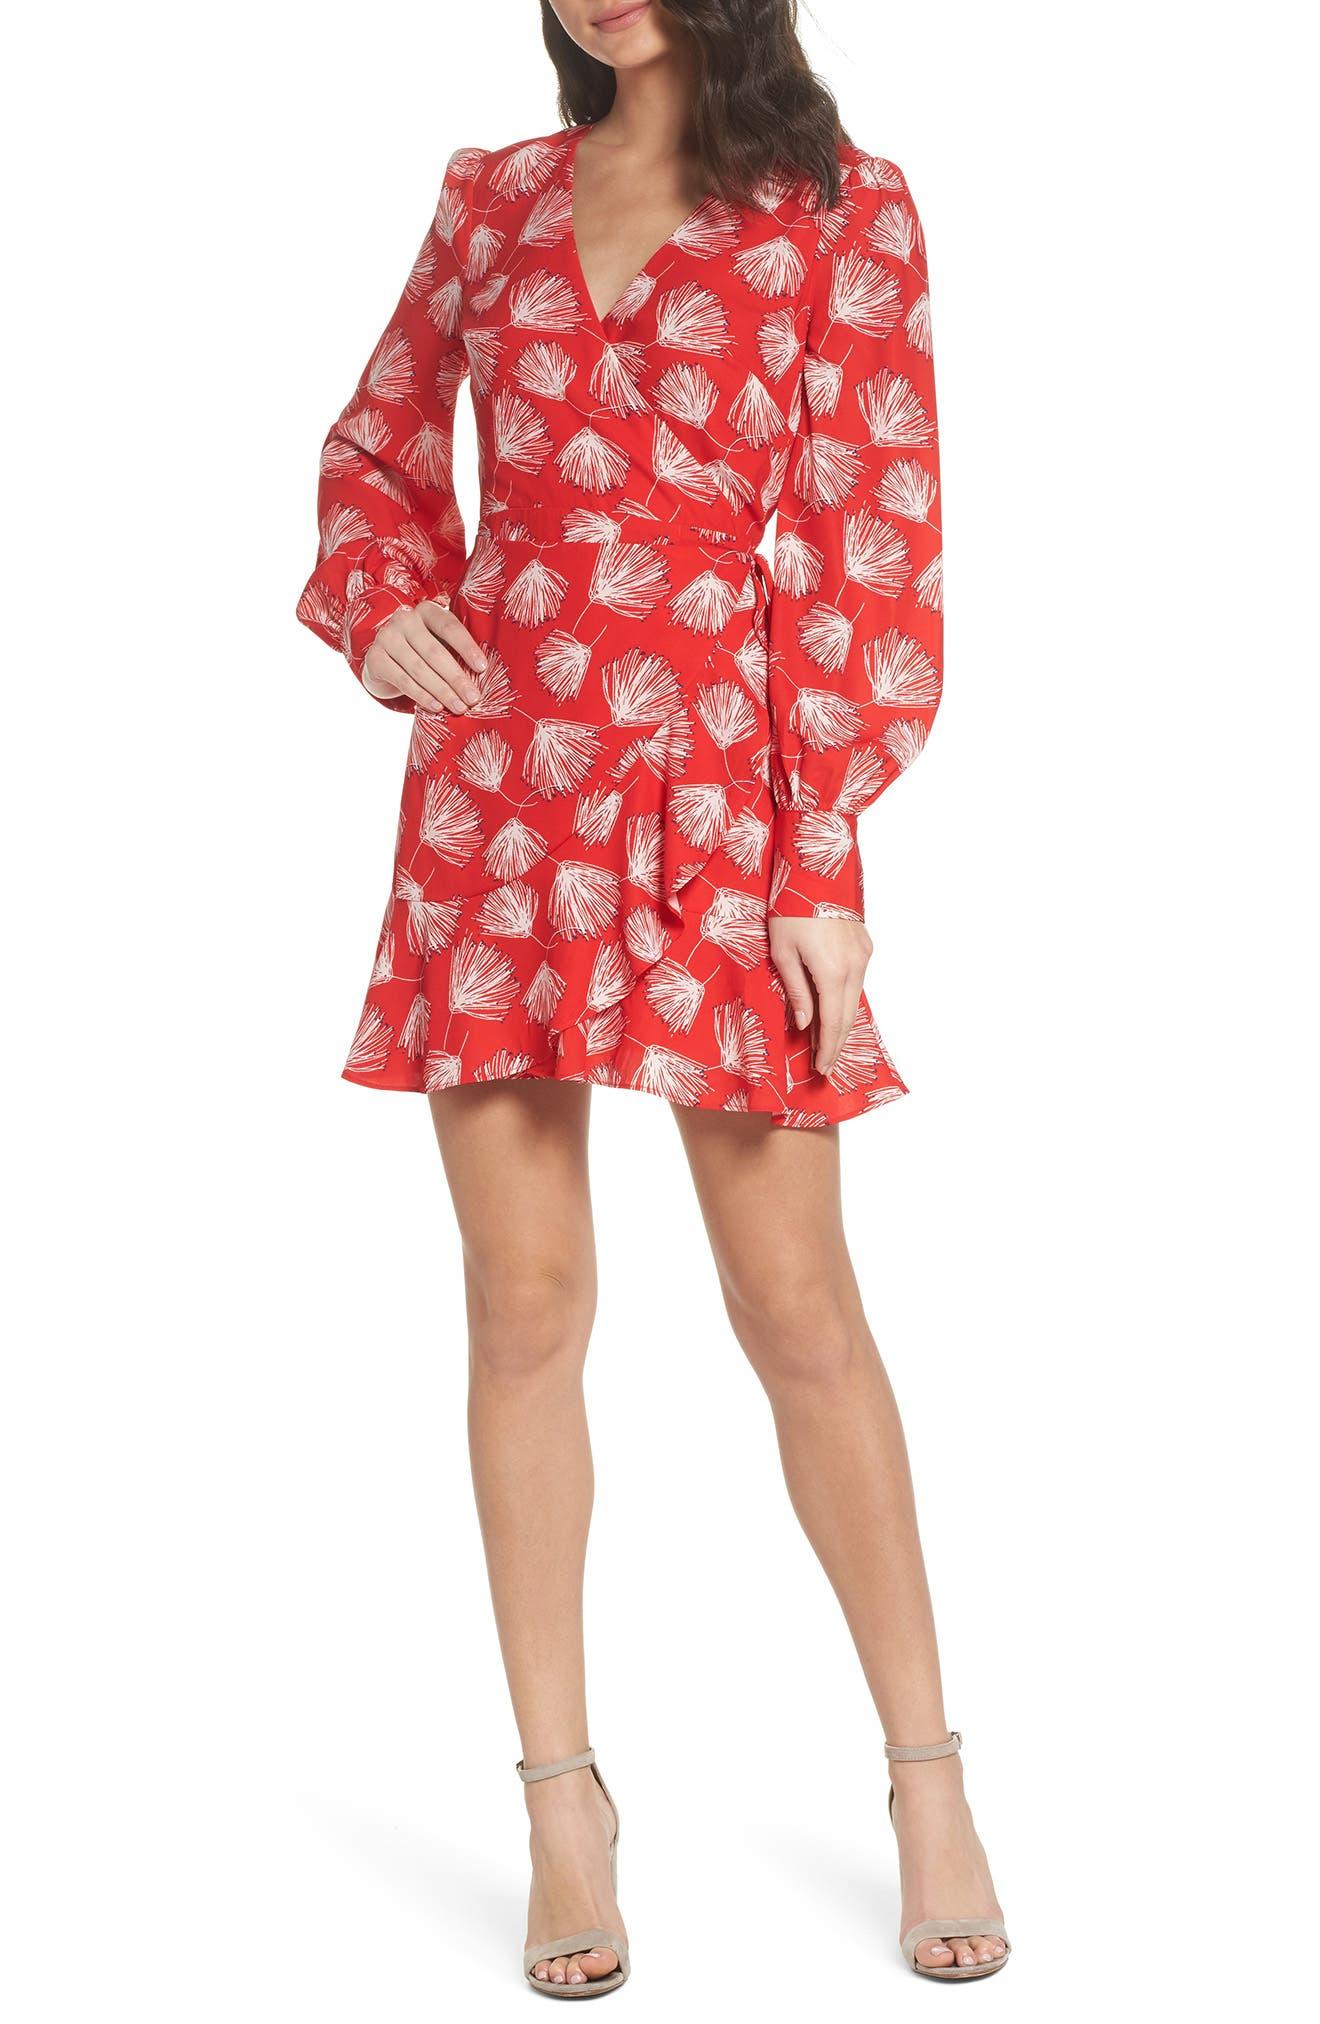 Main Image - Adelyn Rae Sienna Ruffle Dress